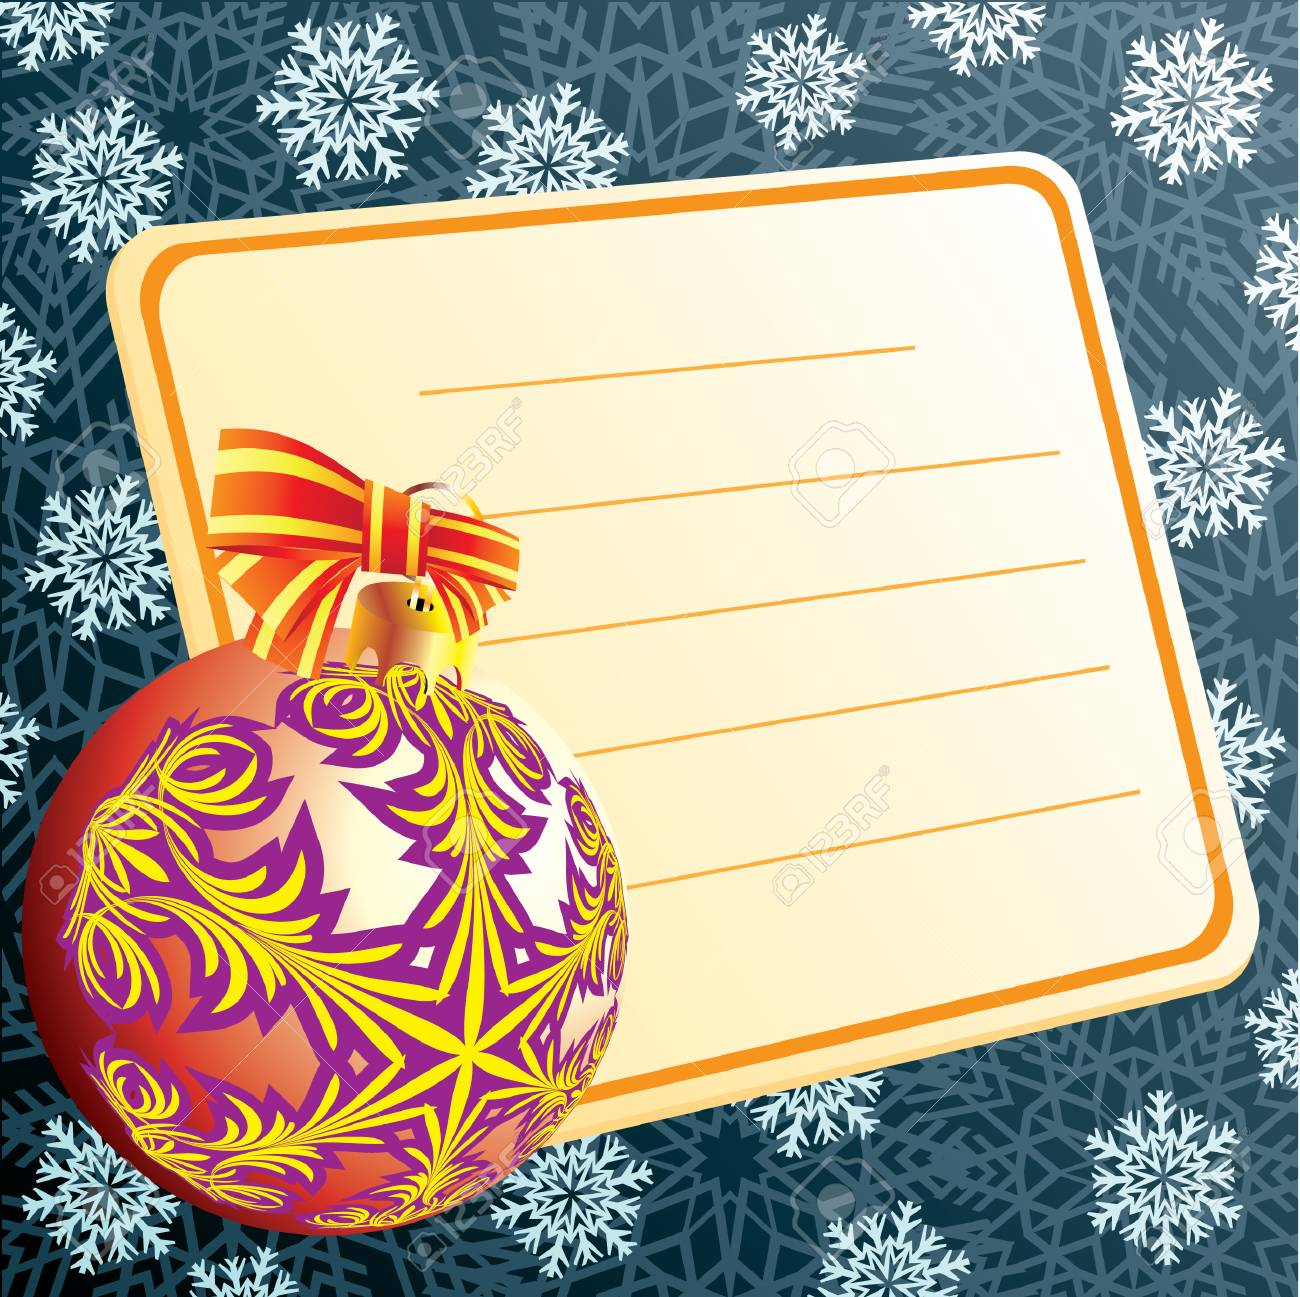 Balls for a decoration. Christmas. Stock Vector - 8115969